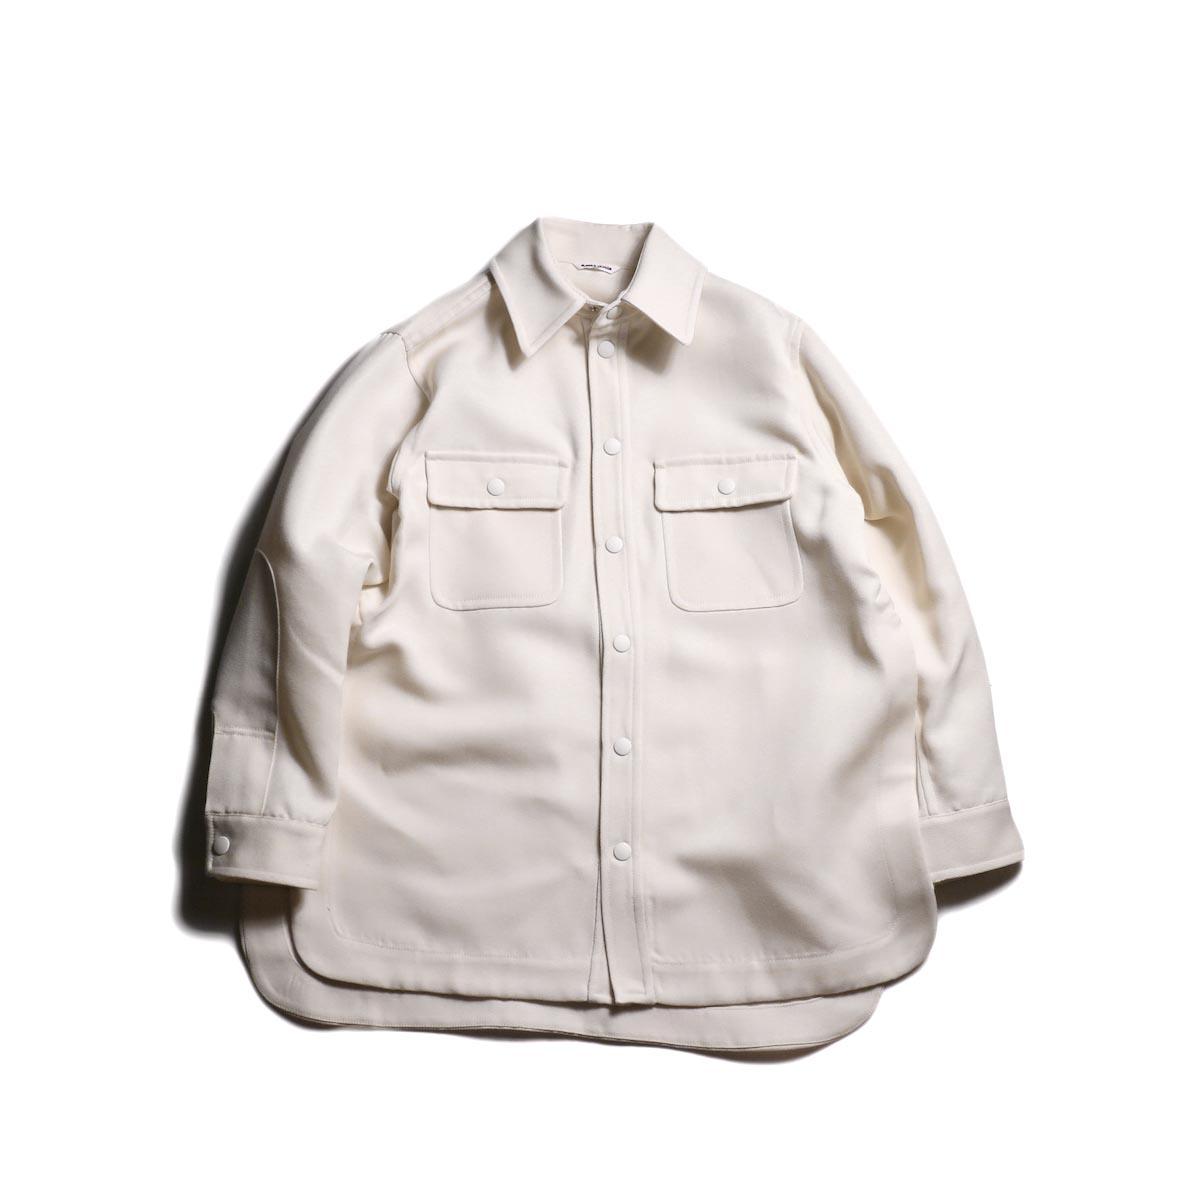 FUMIKA UCHIDA / Wool/Poli Tricotine Shirt Jacket (O.White)